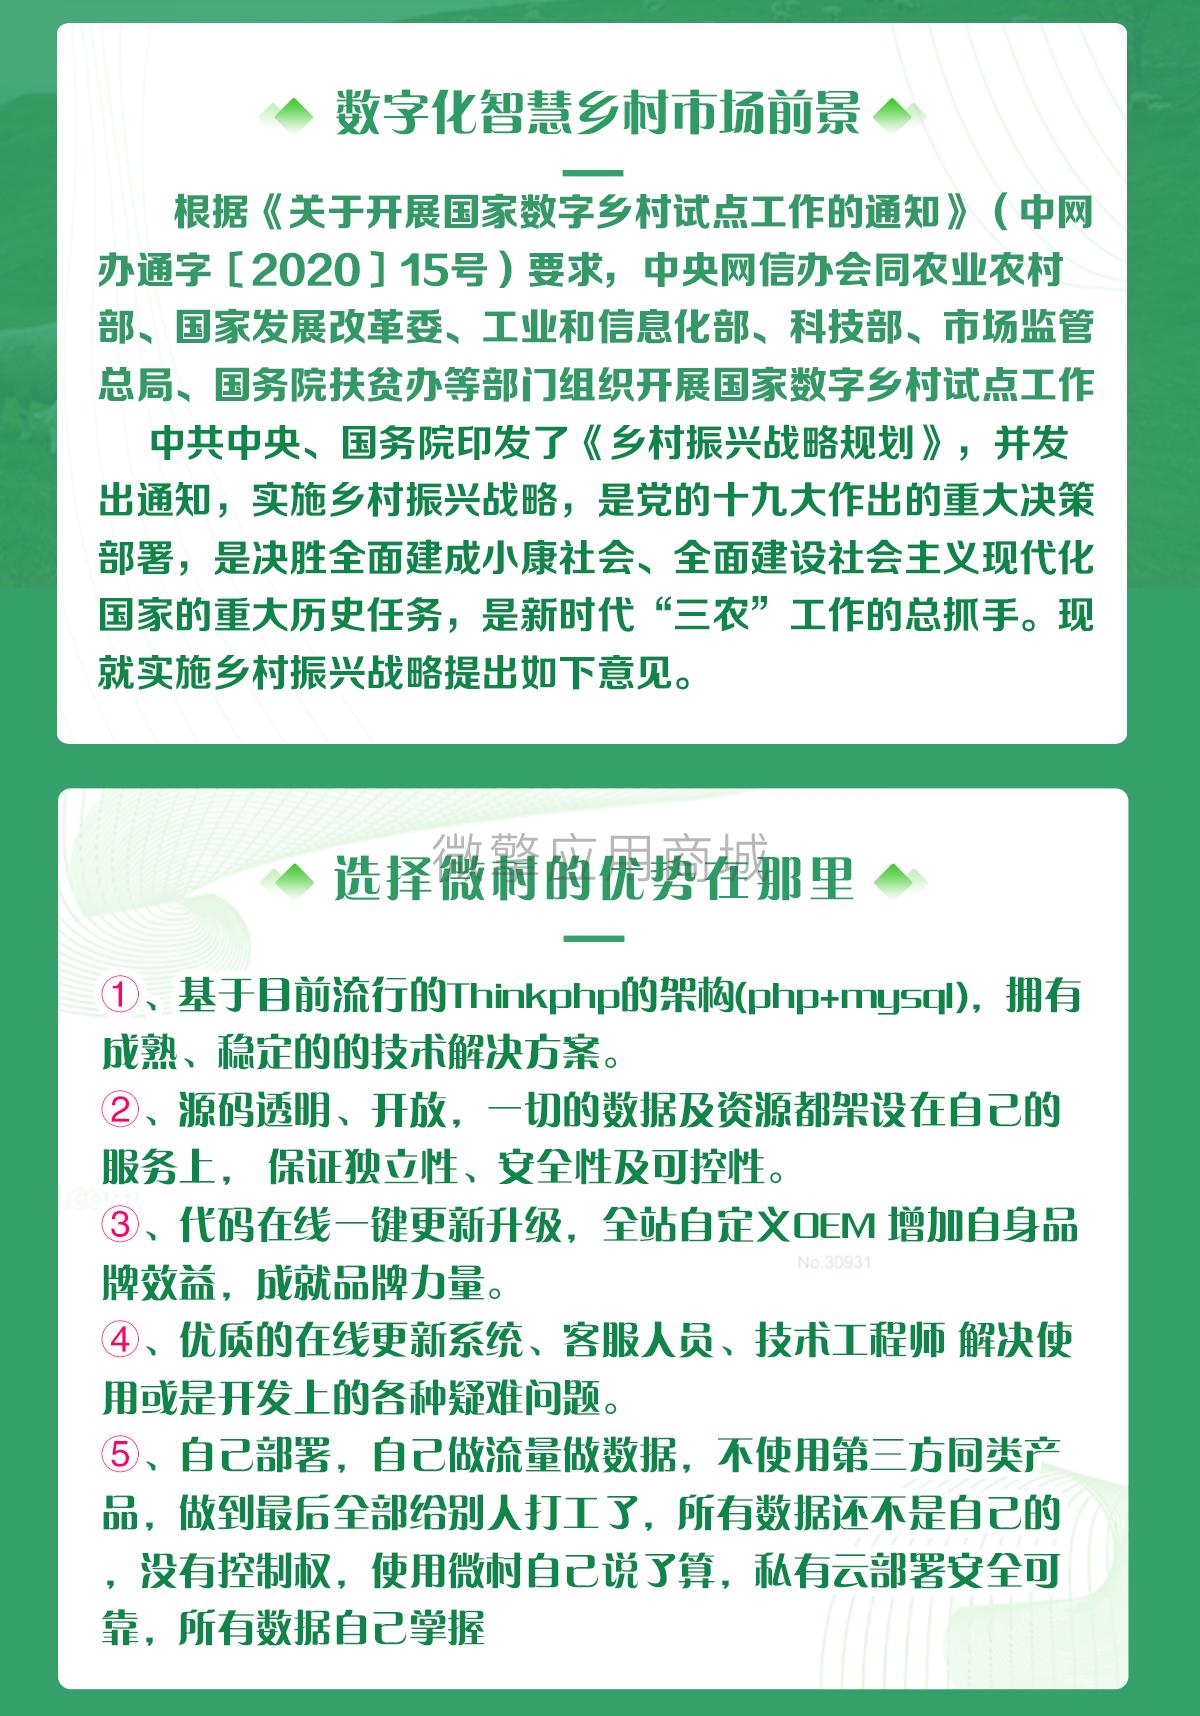 微村介绍页面_03.png